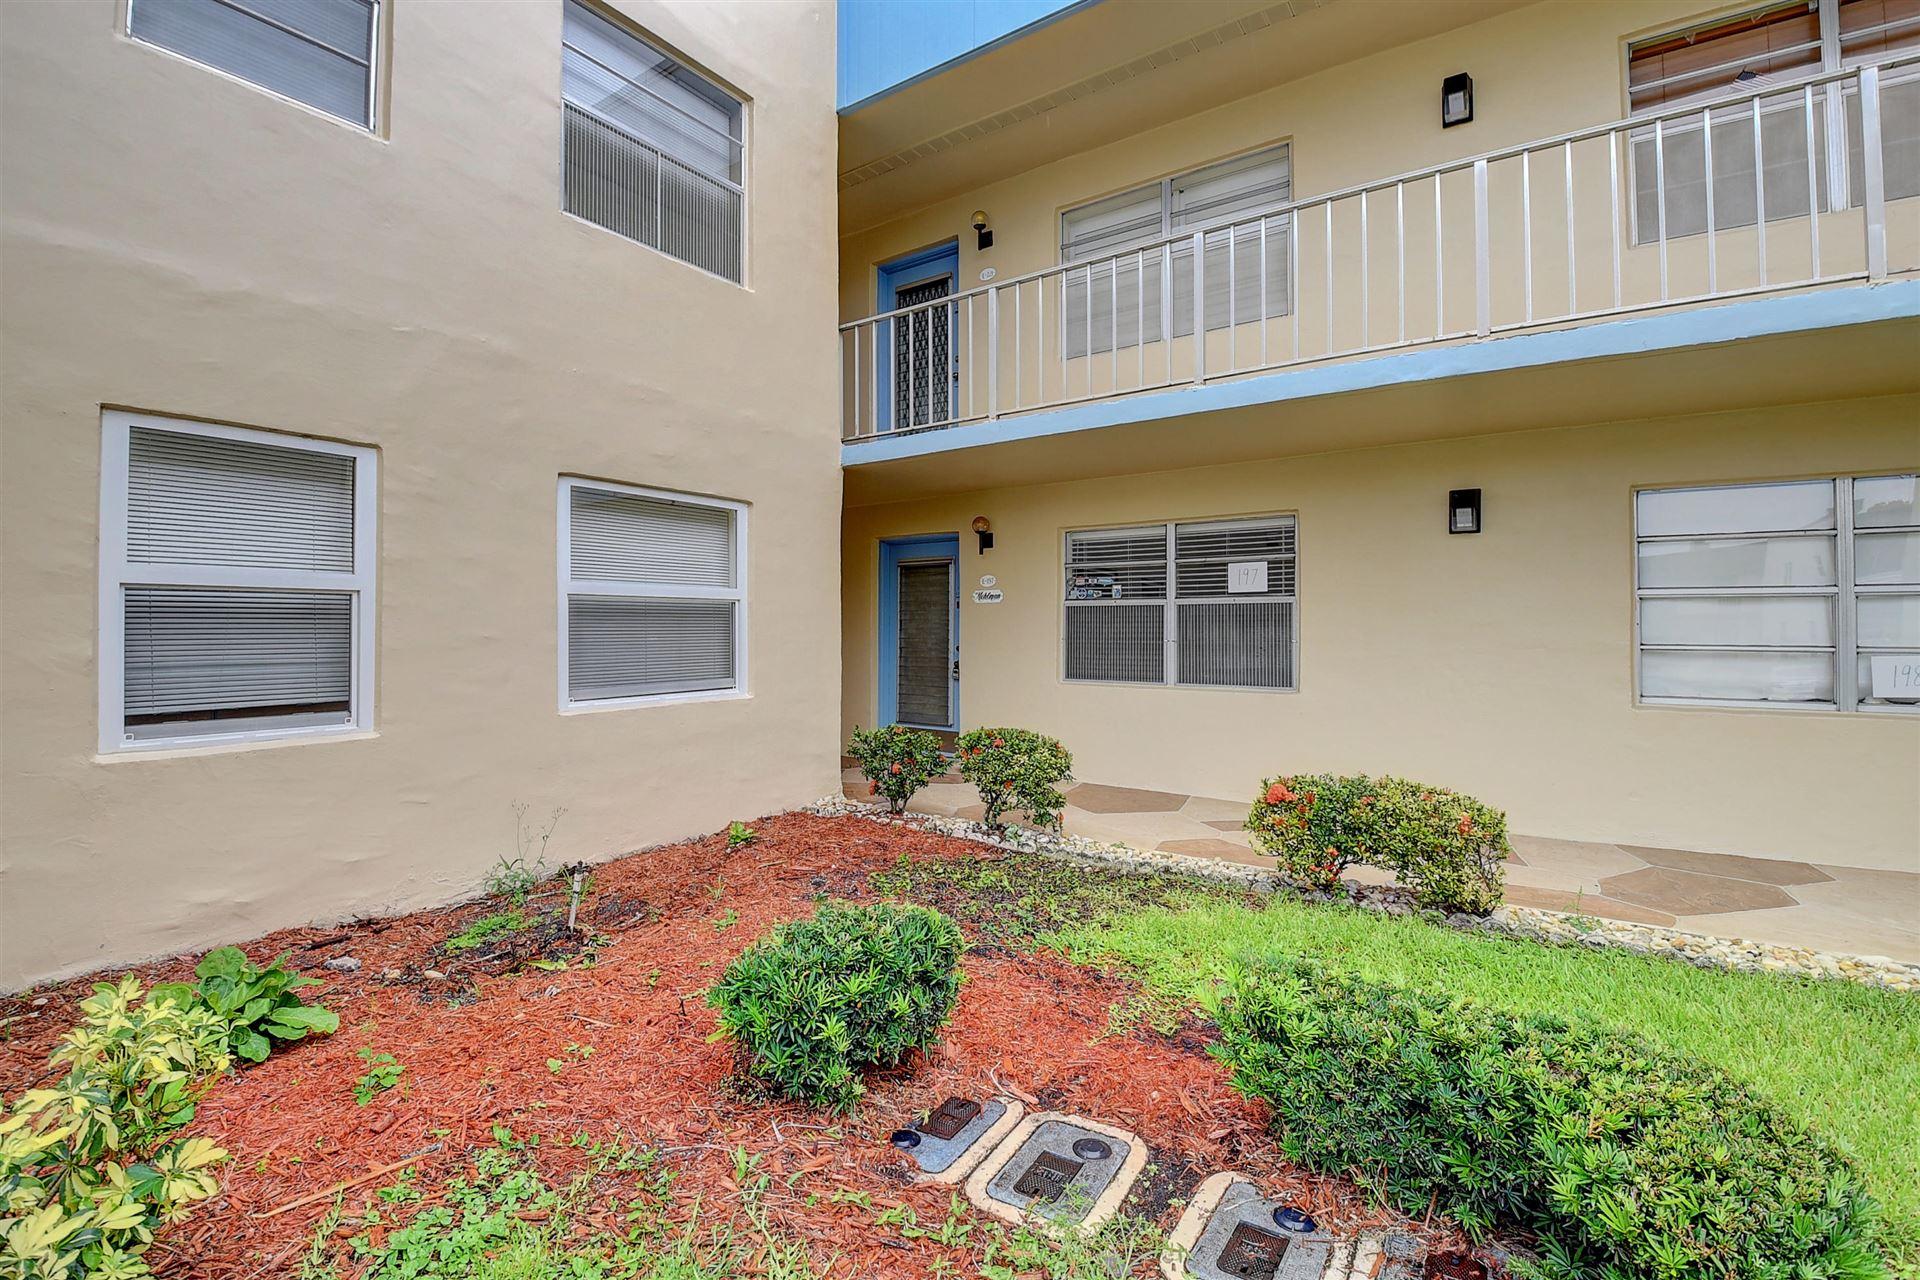 197 Burgundy E, Delray Beach, FL 33484 - MLS#: RX-10730598